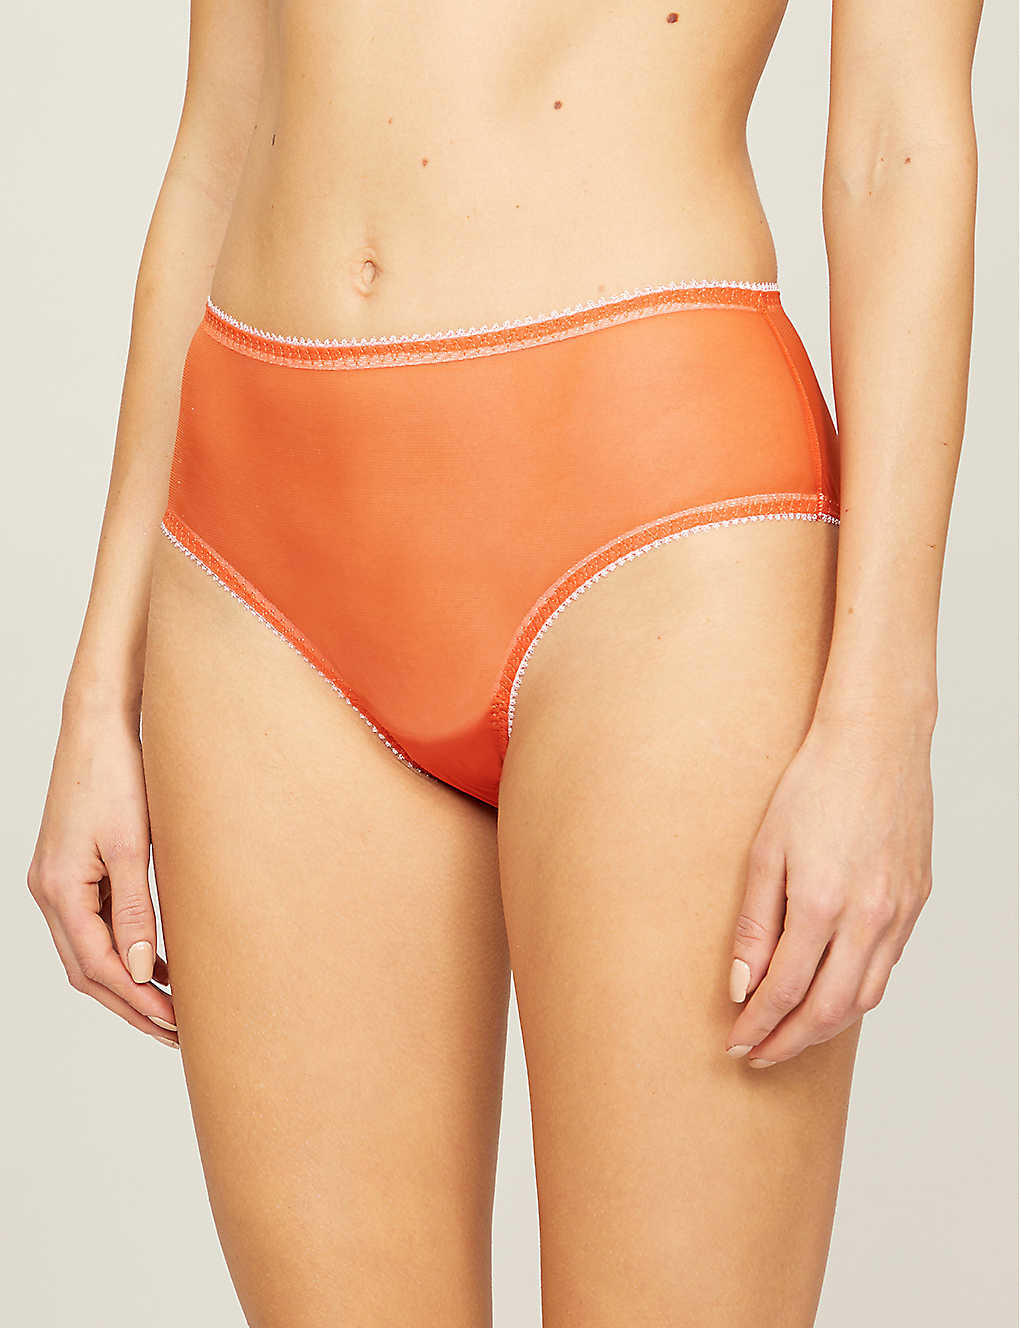 Mesh high waist panties-2